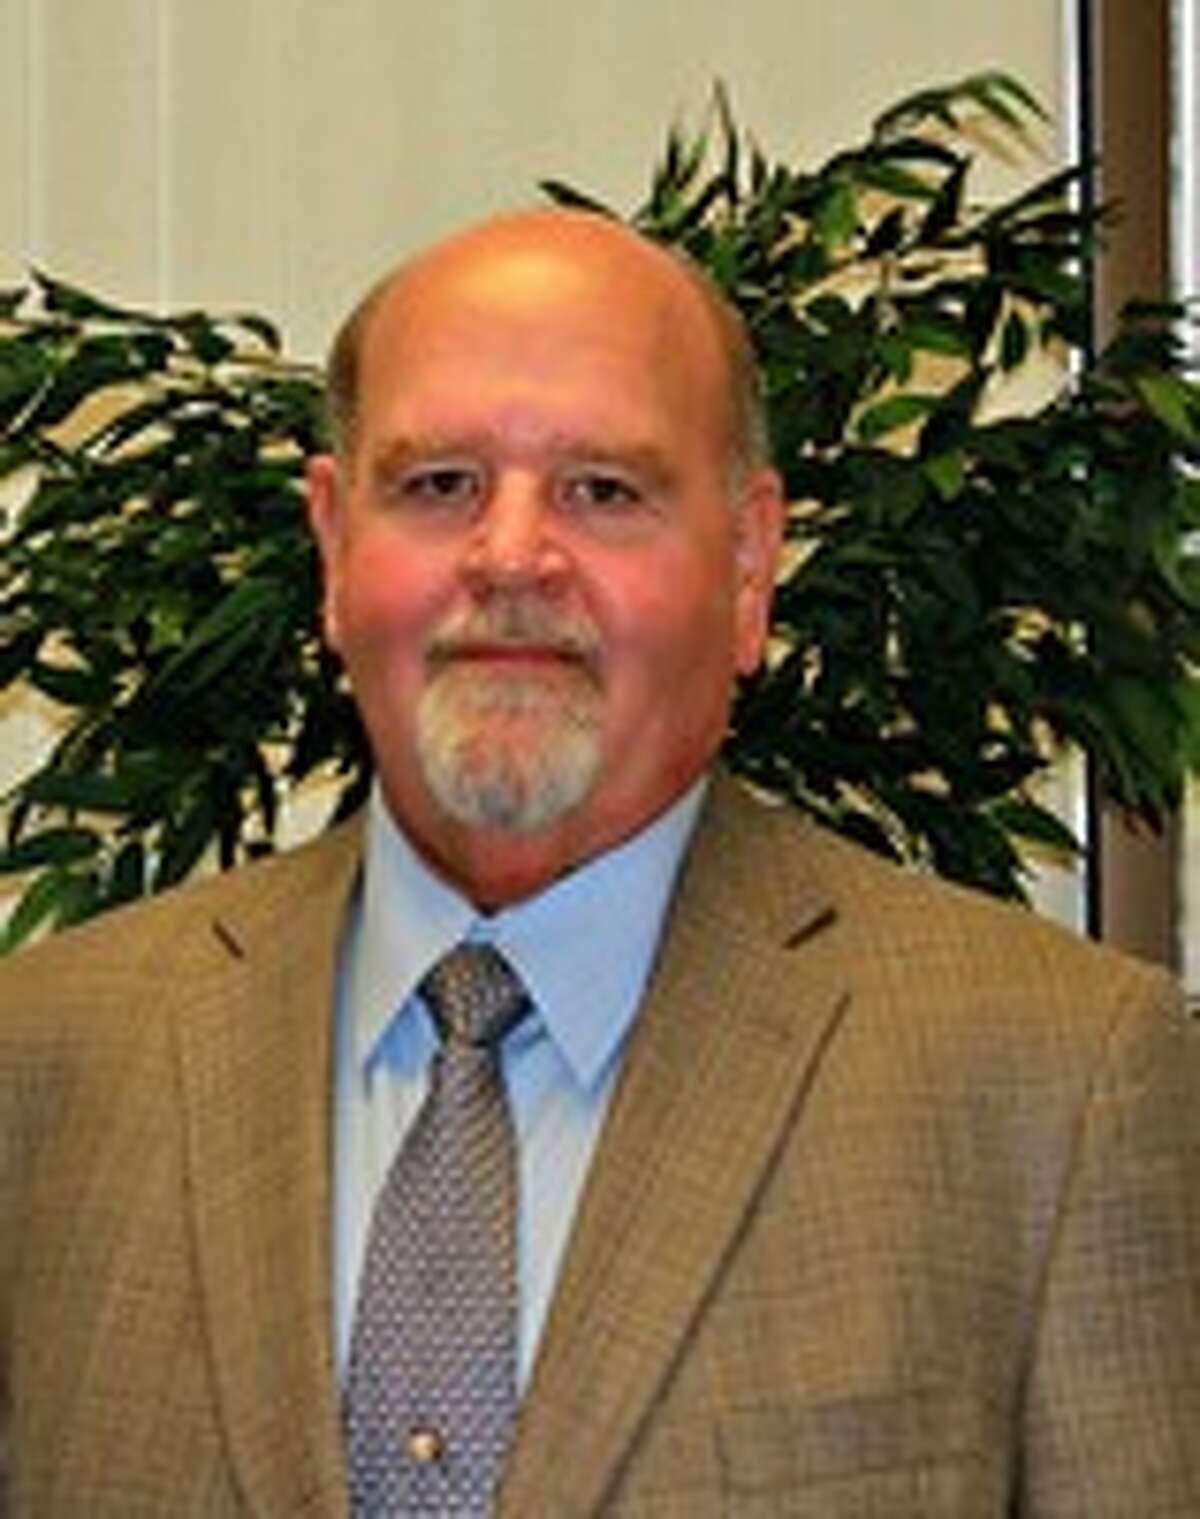 The Onalaska ISD superintendent apologized Monday for saying